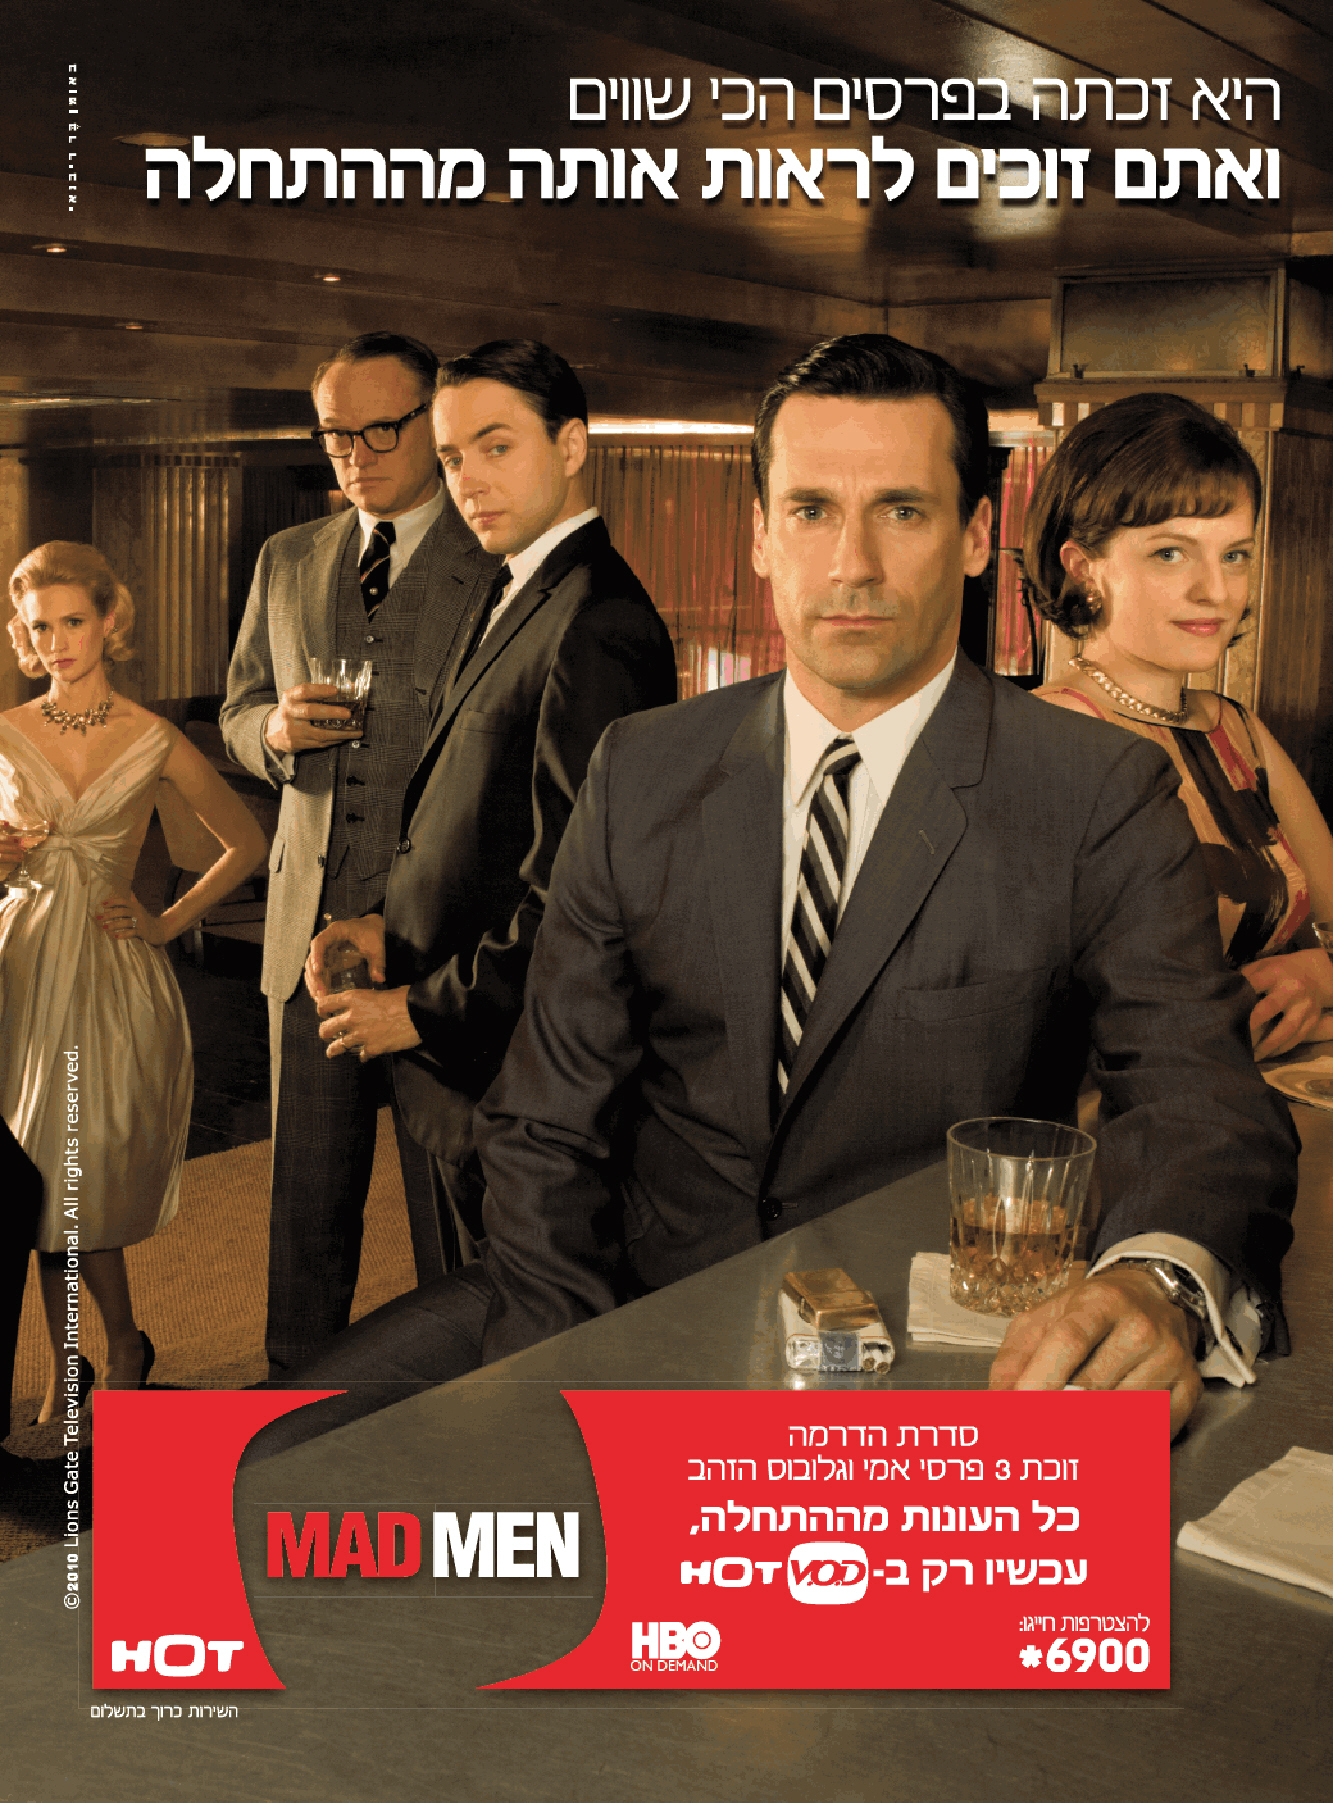 Mad Men - פרינט של באומן בר ריבנאי